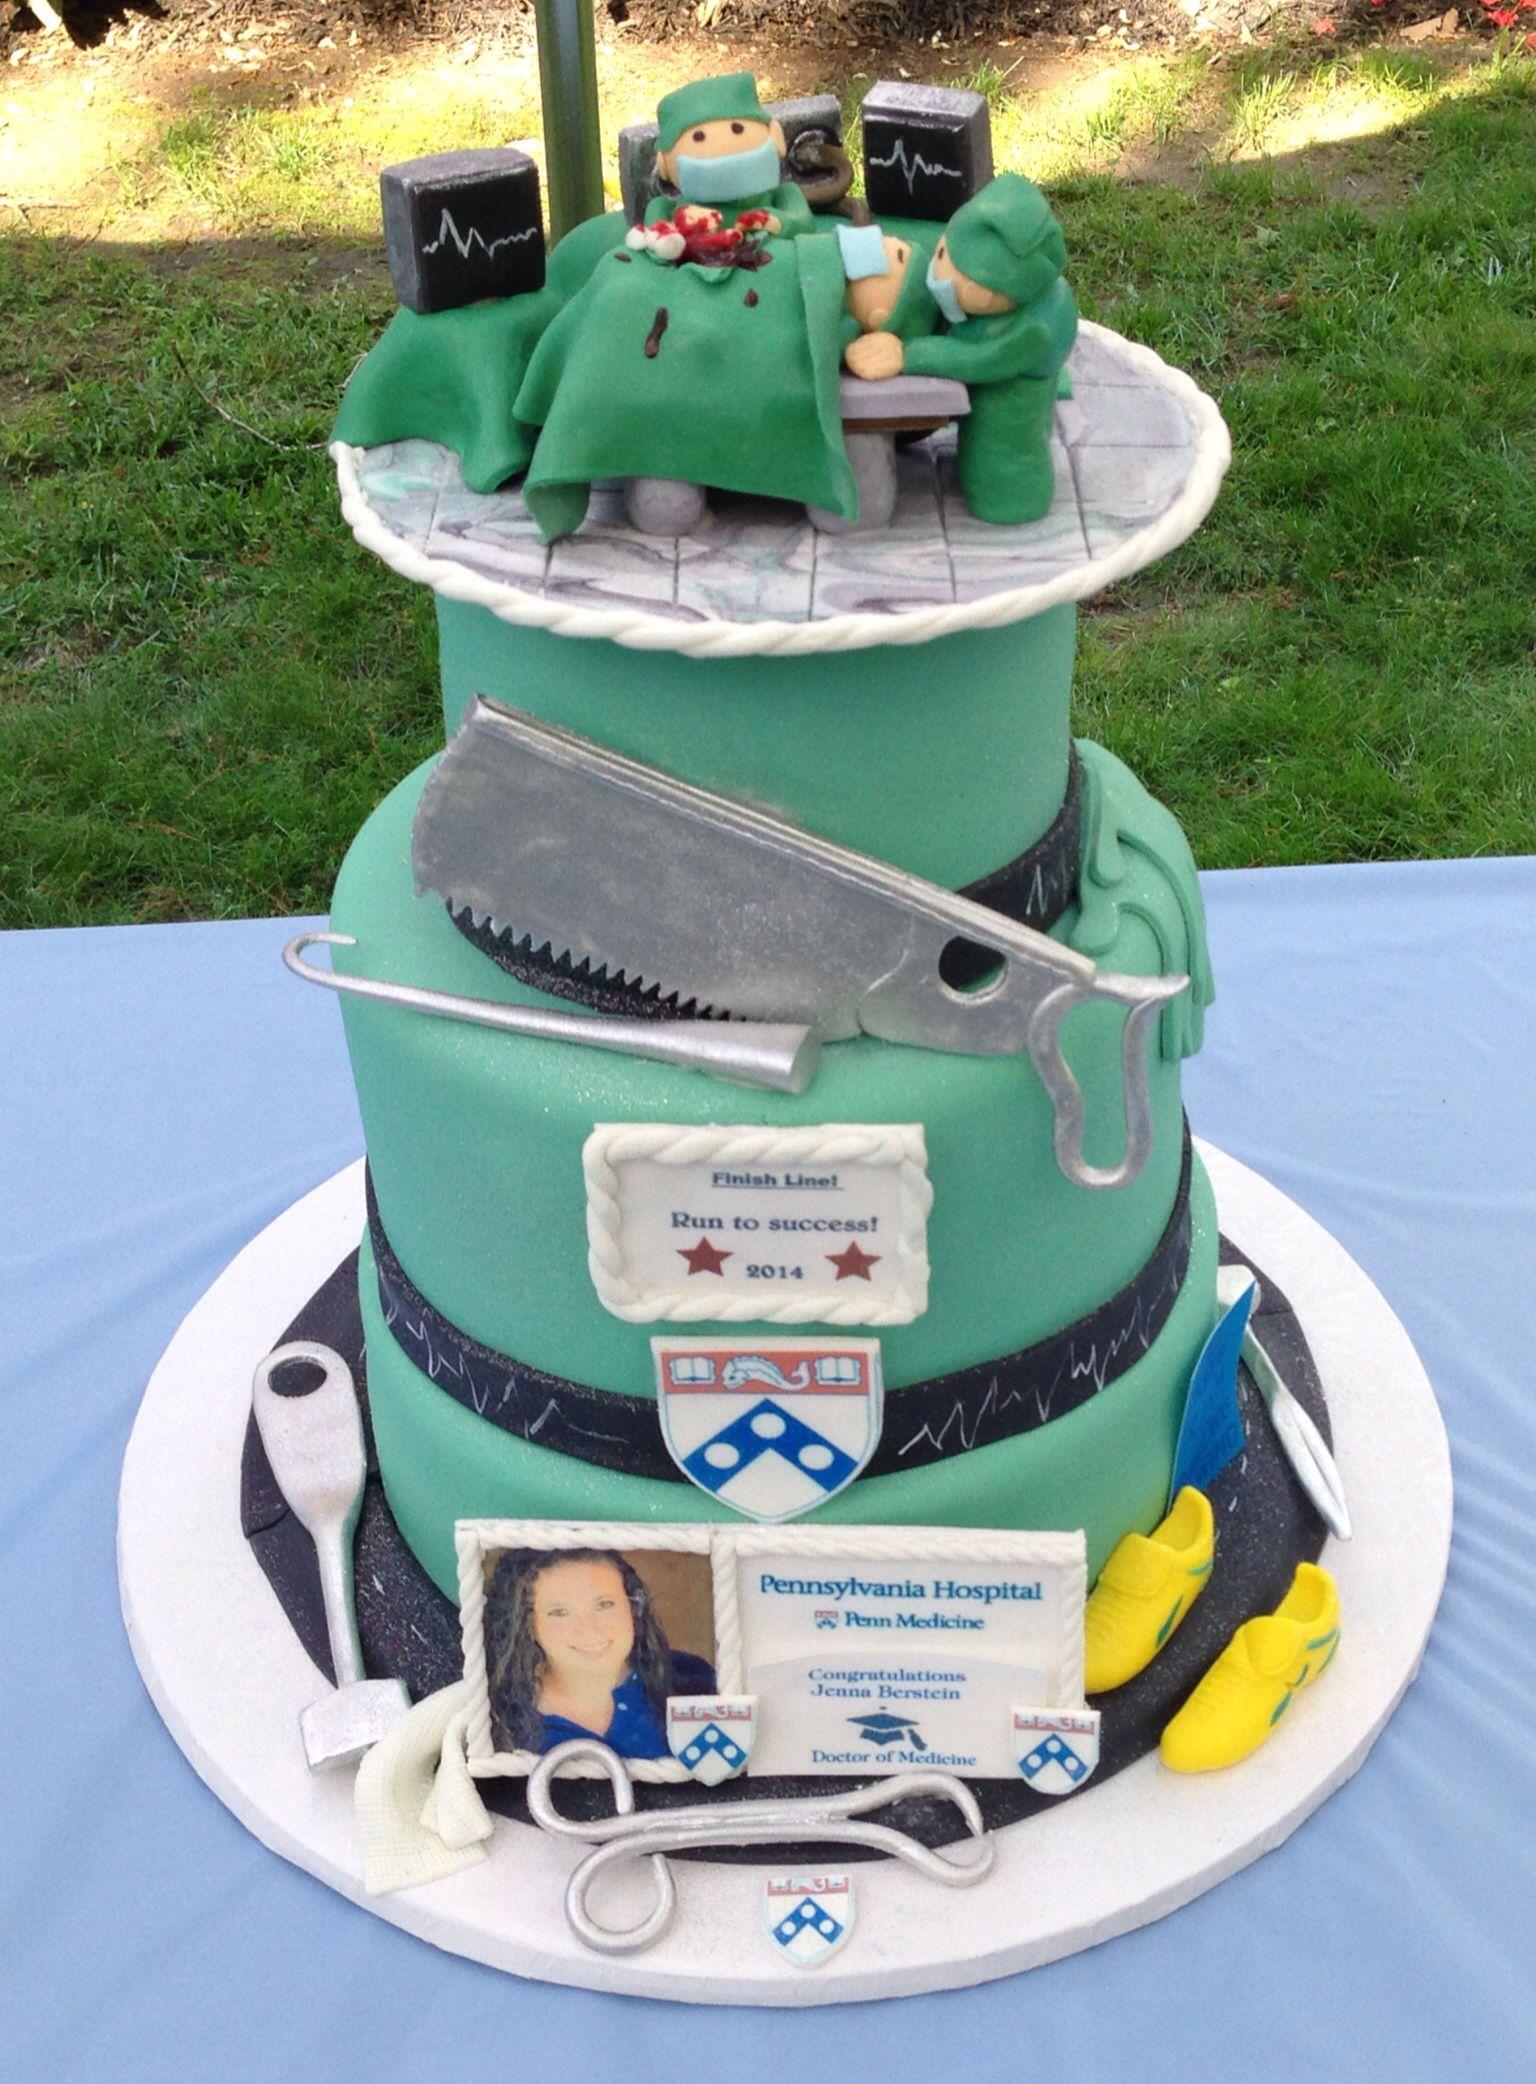 Orthopedic doctor cake www.thefairfieldcakelady.com